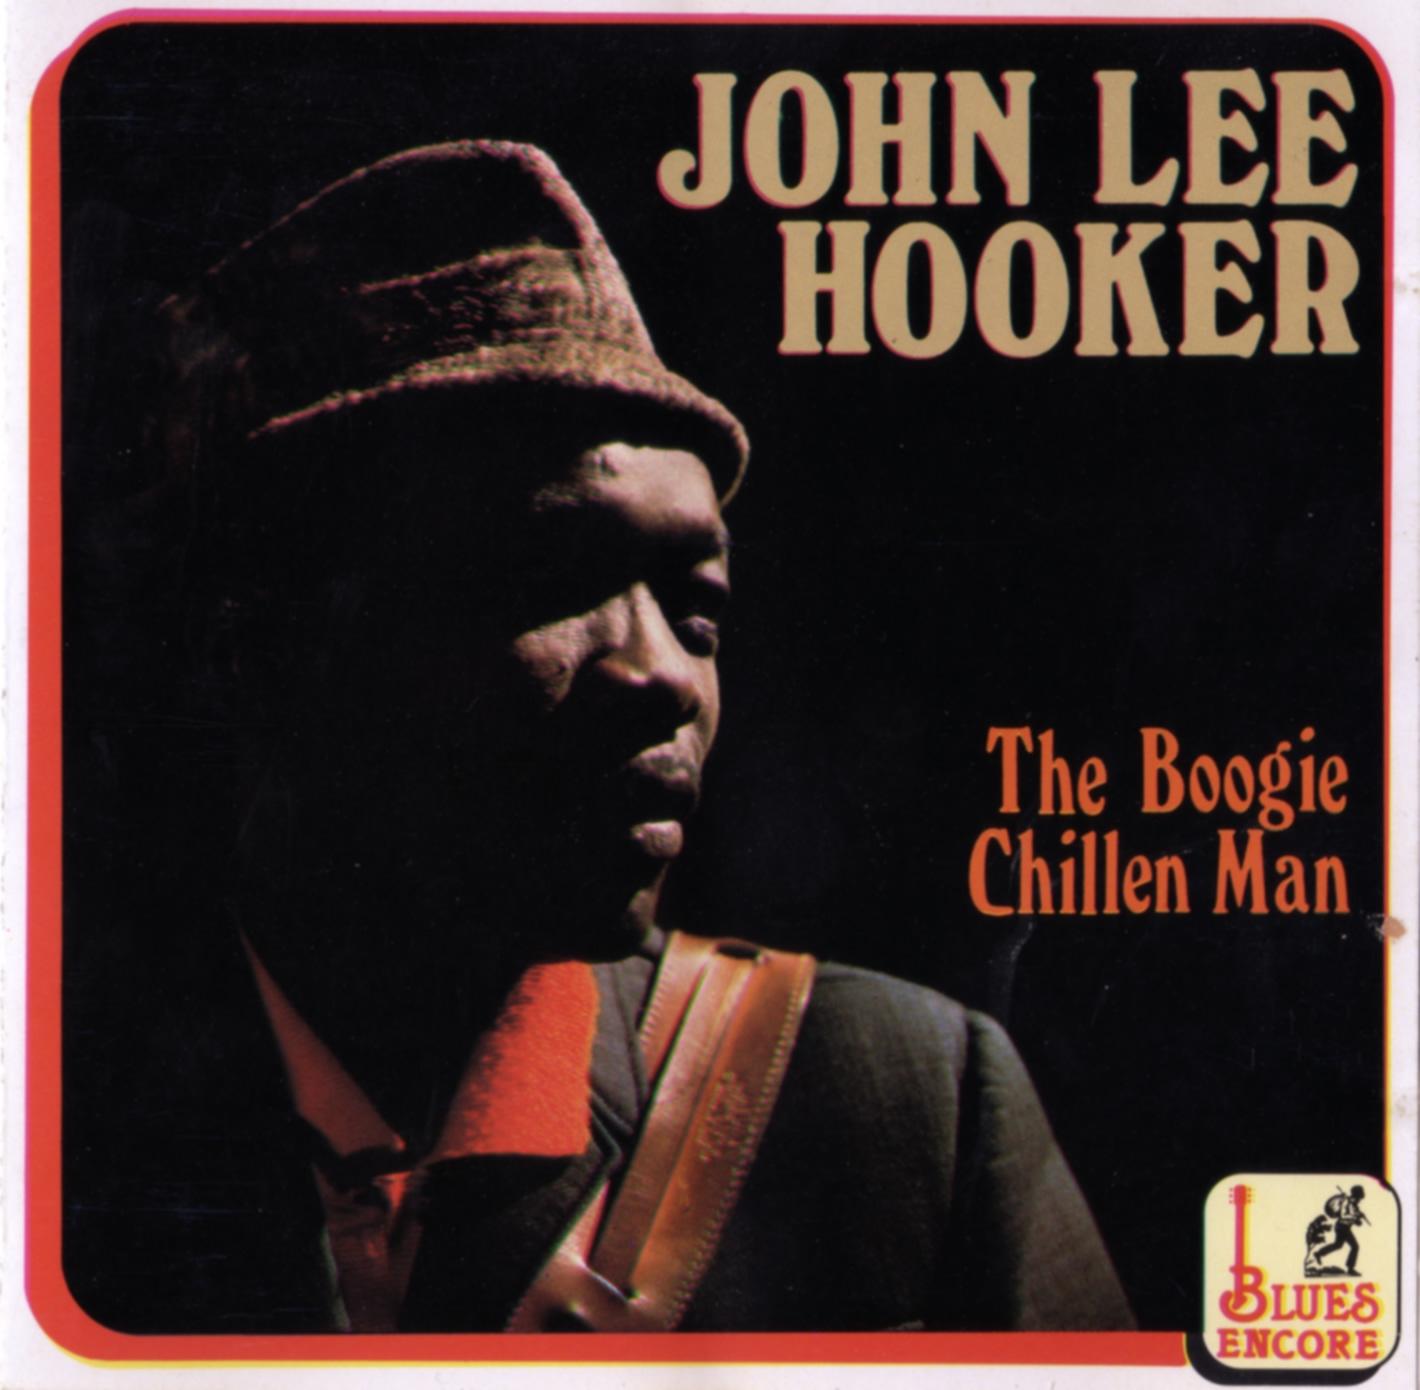 John Lee Hooker Boogie Chillen cover art